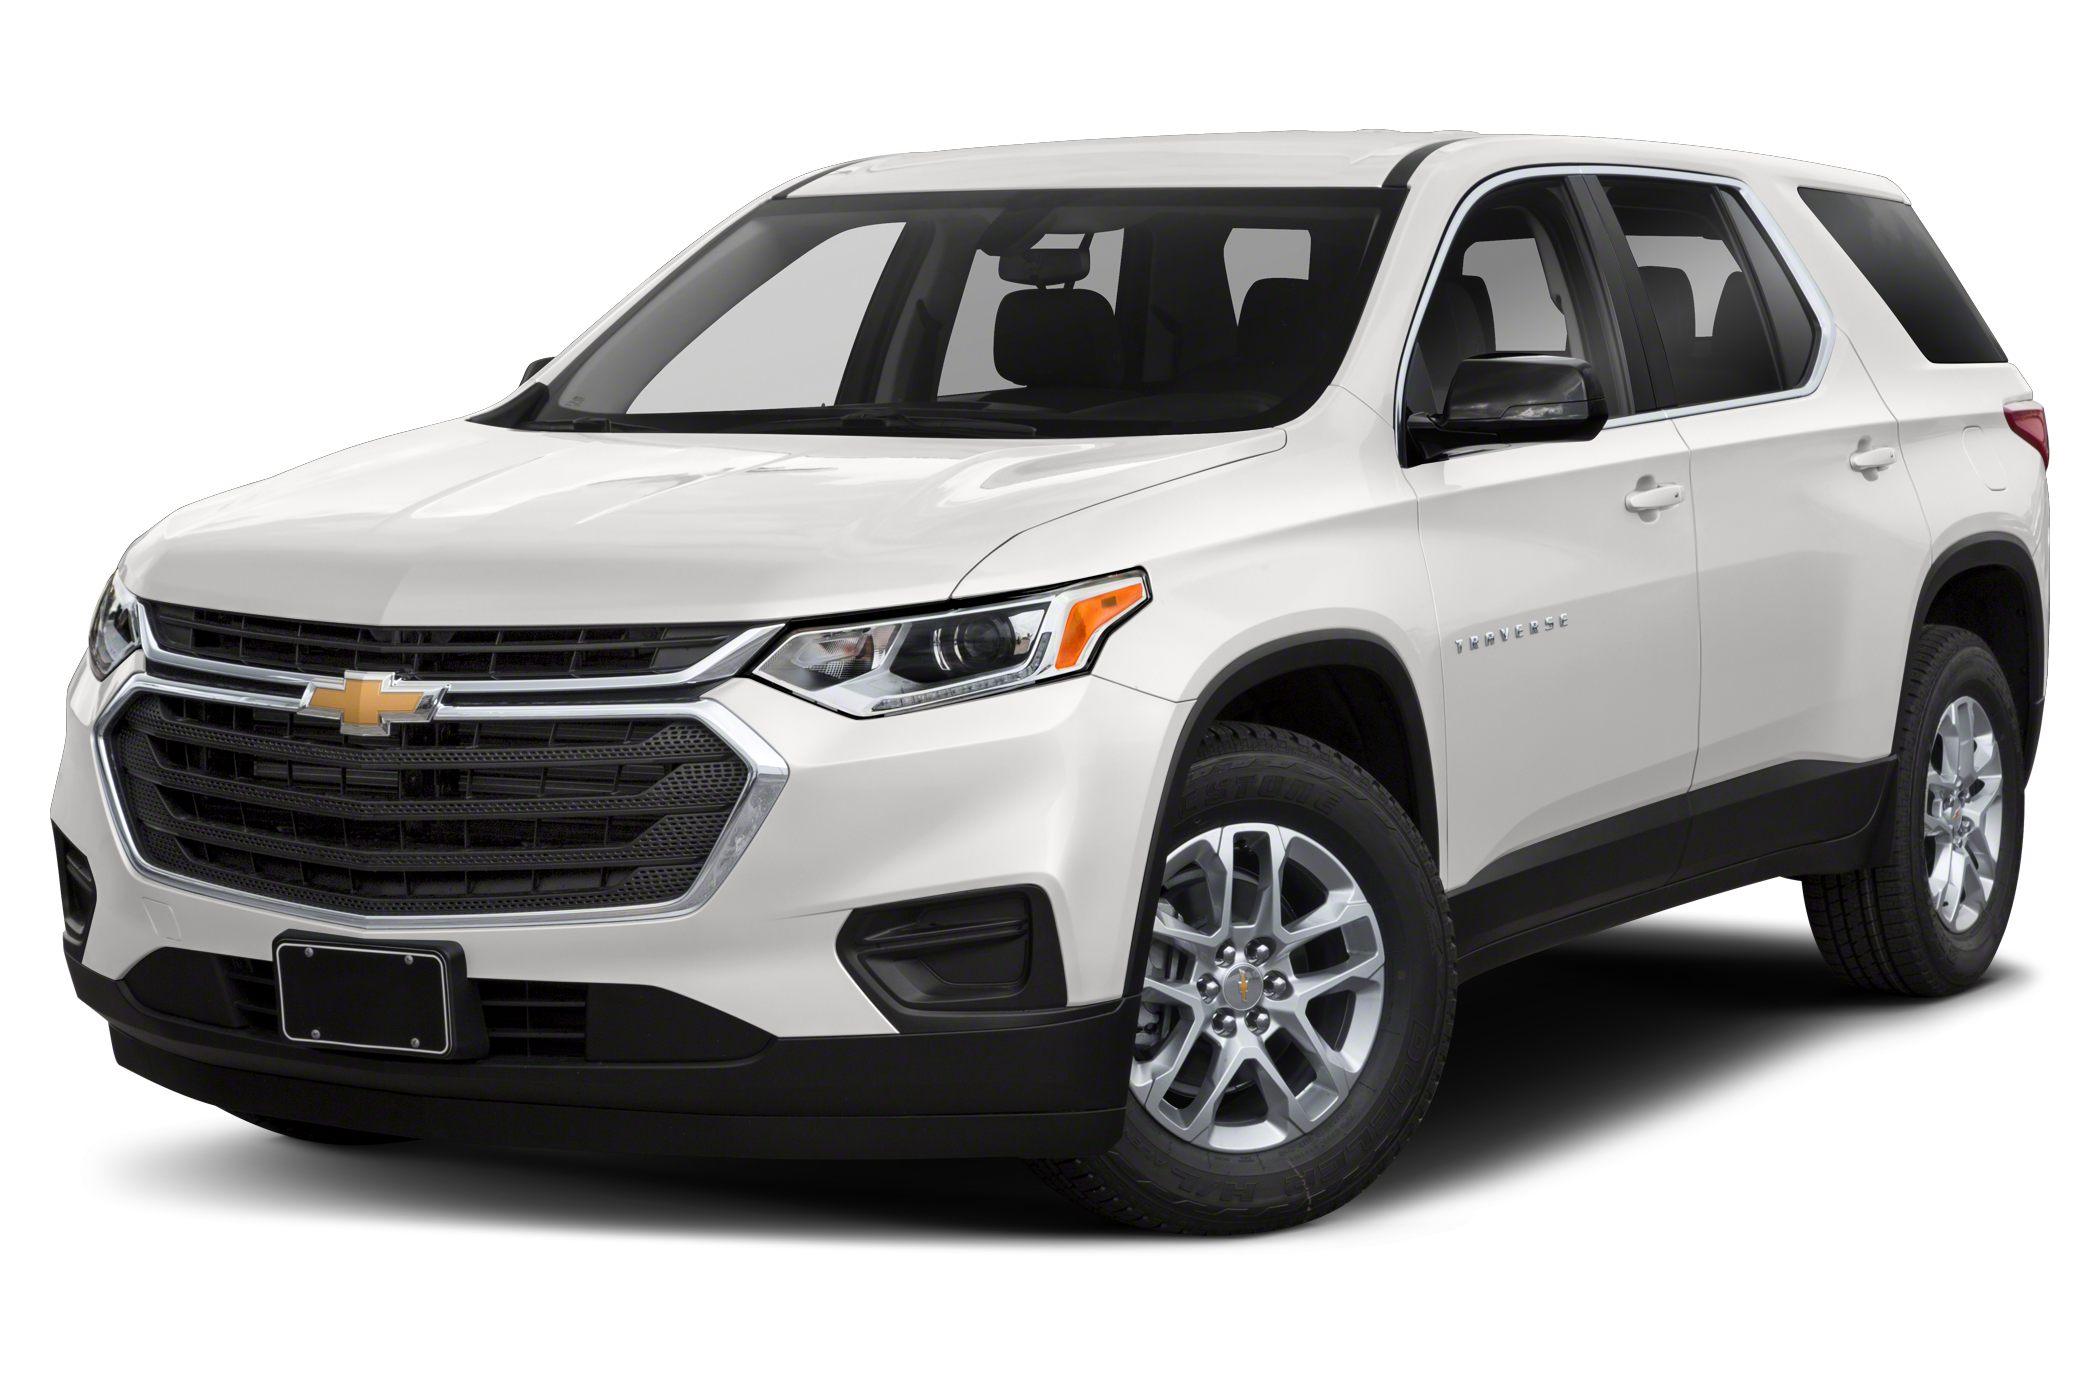 2020 Chevrolet Traverse Pictures